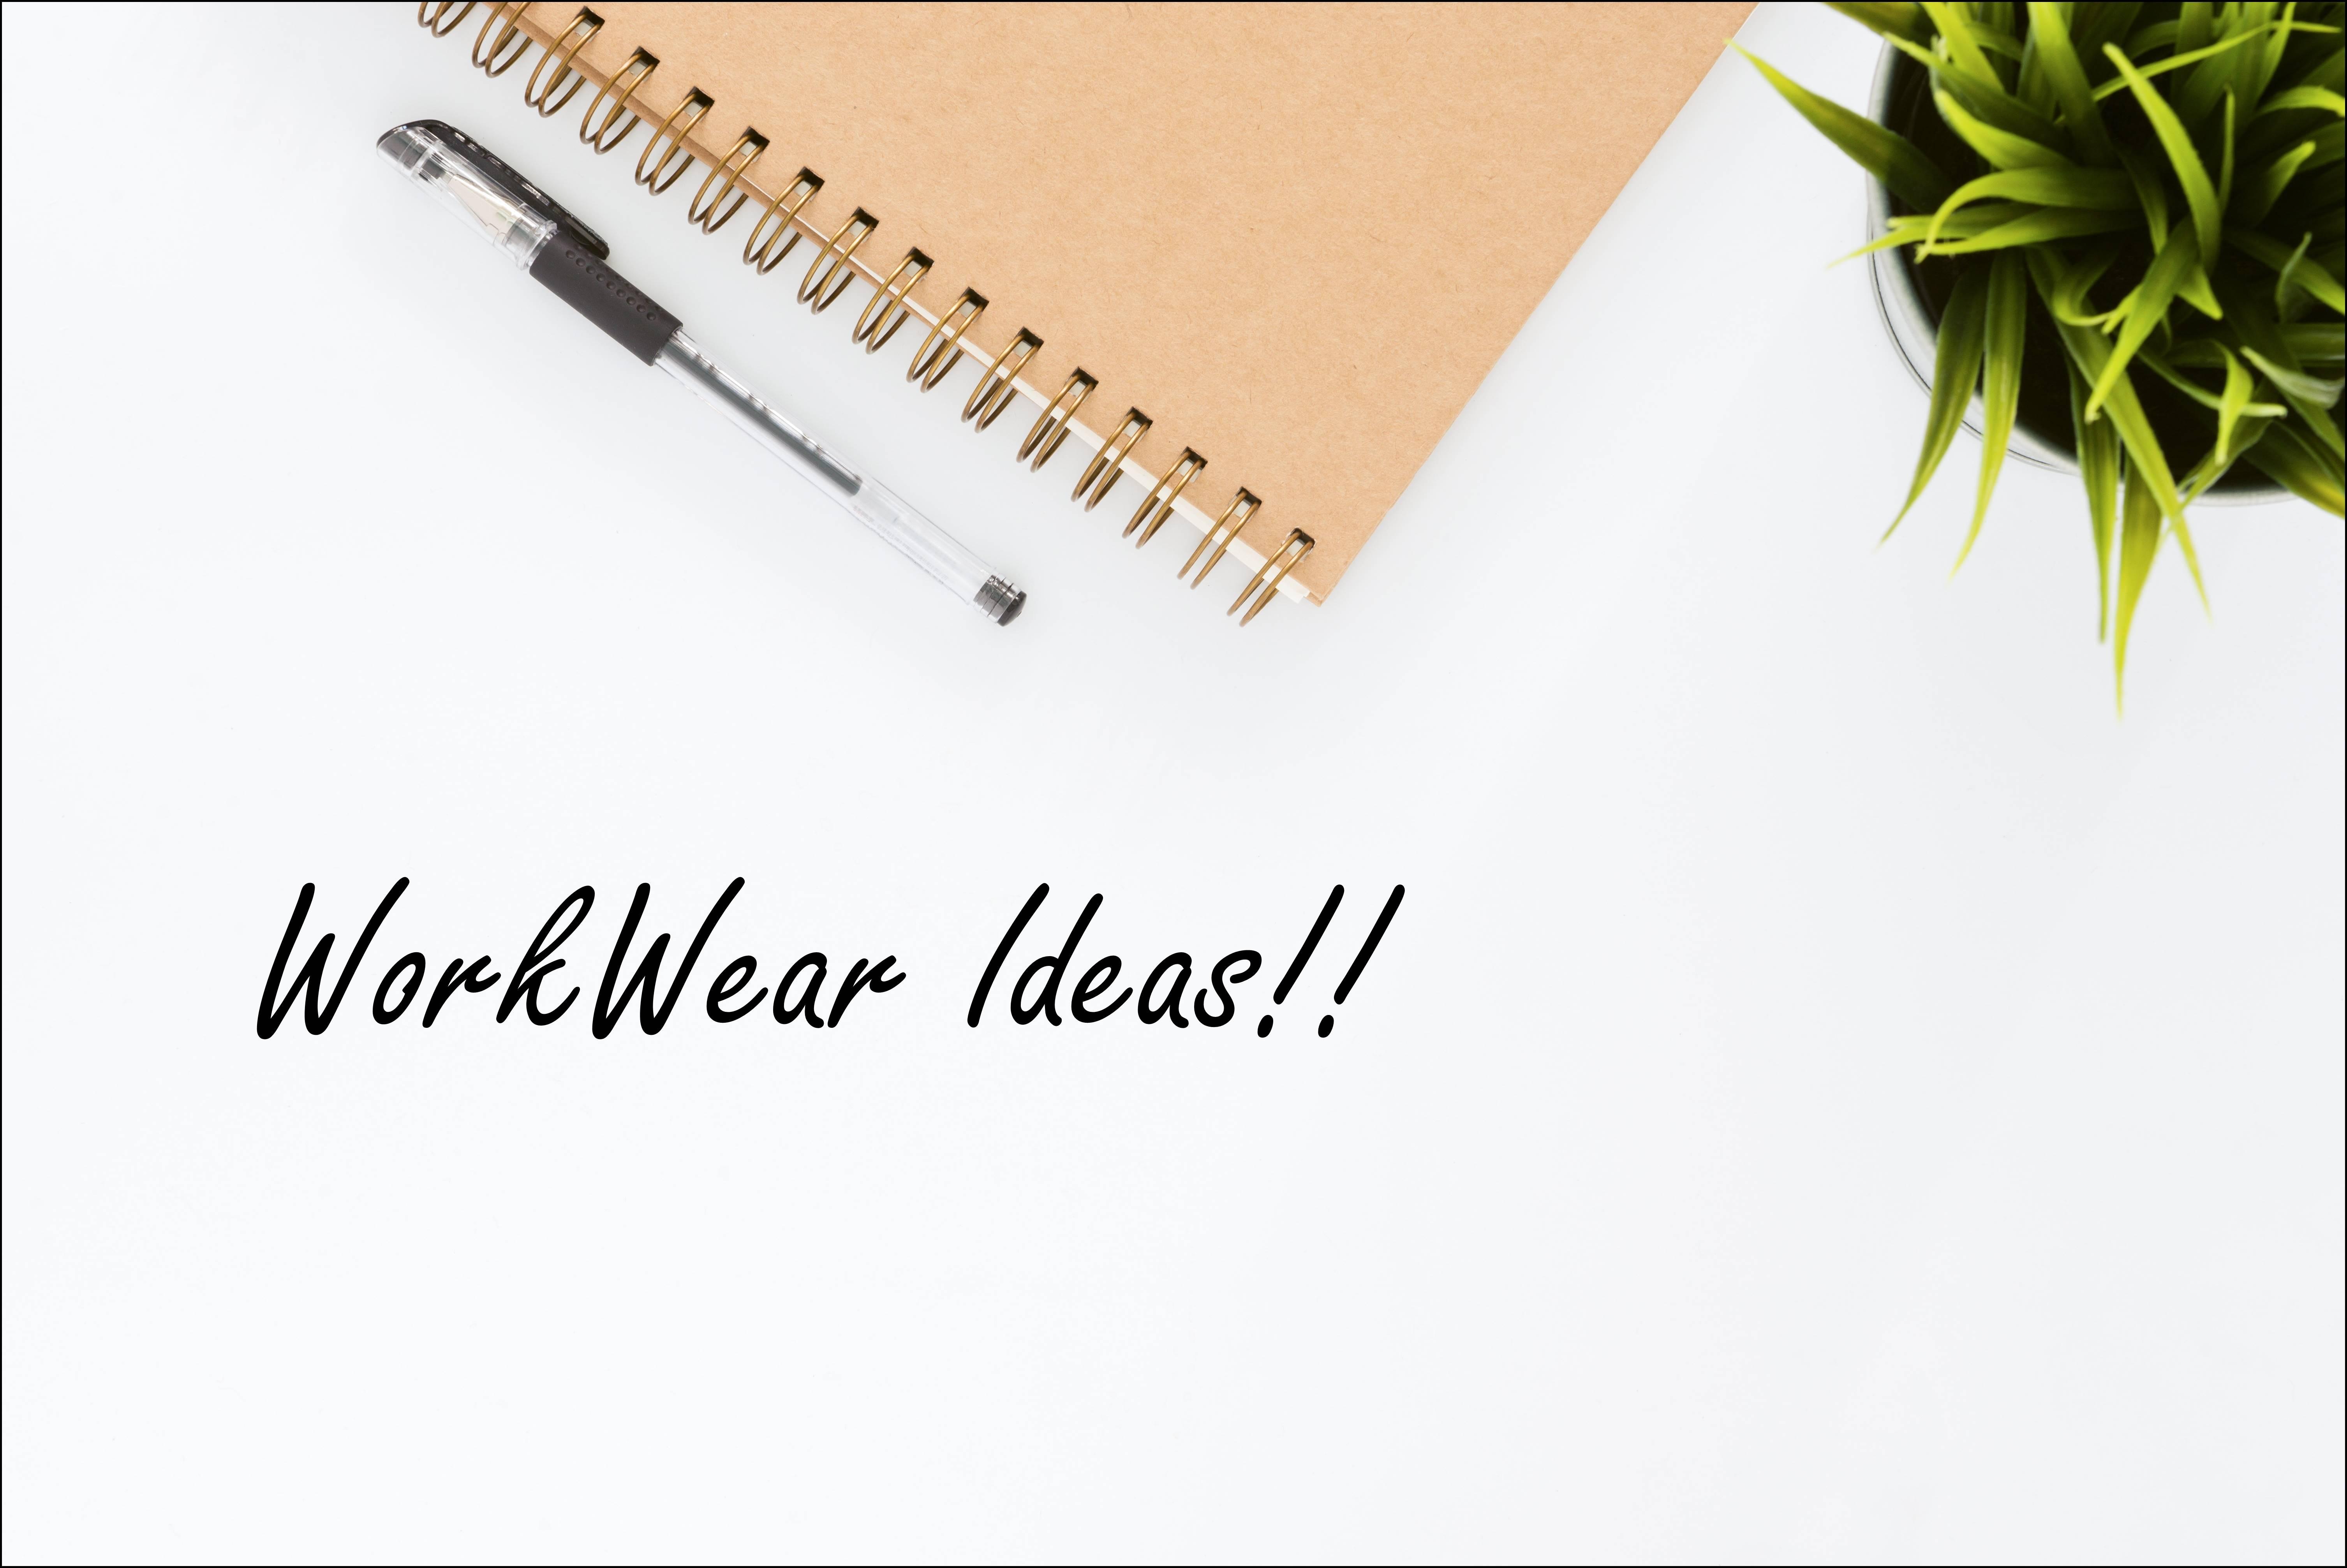 3 Workwear looks !!